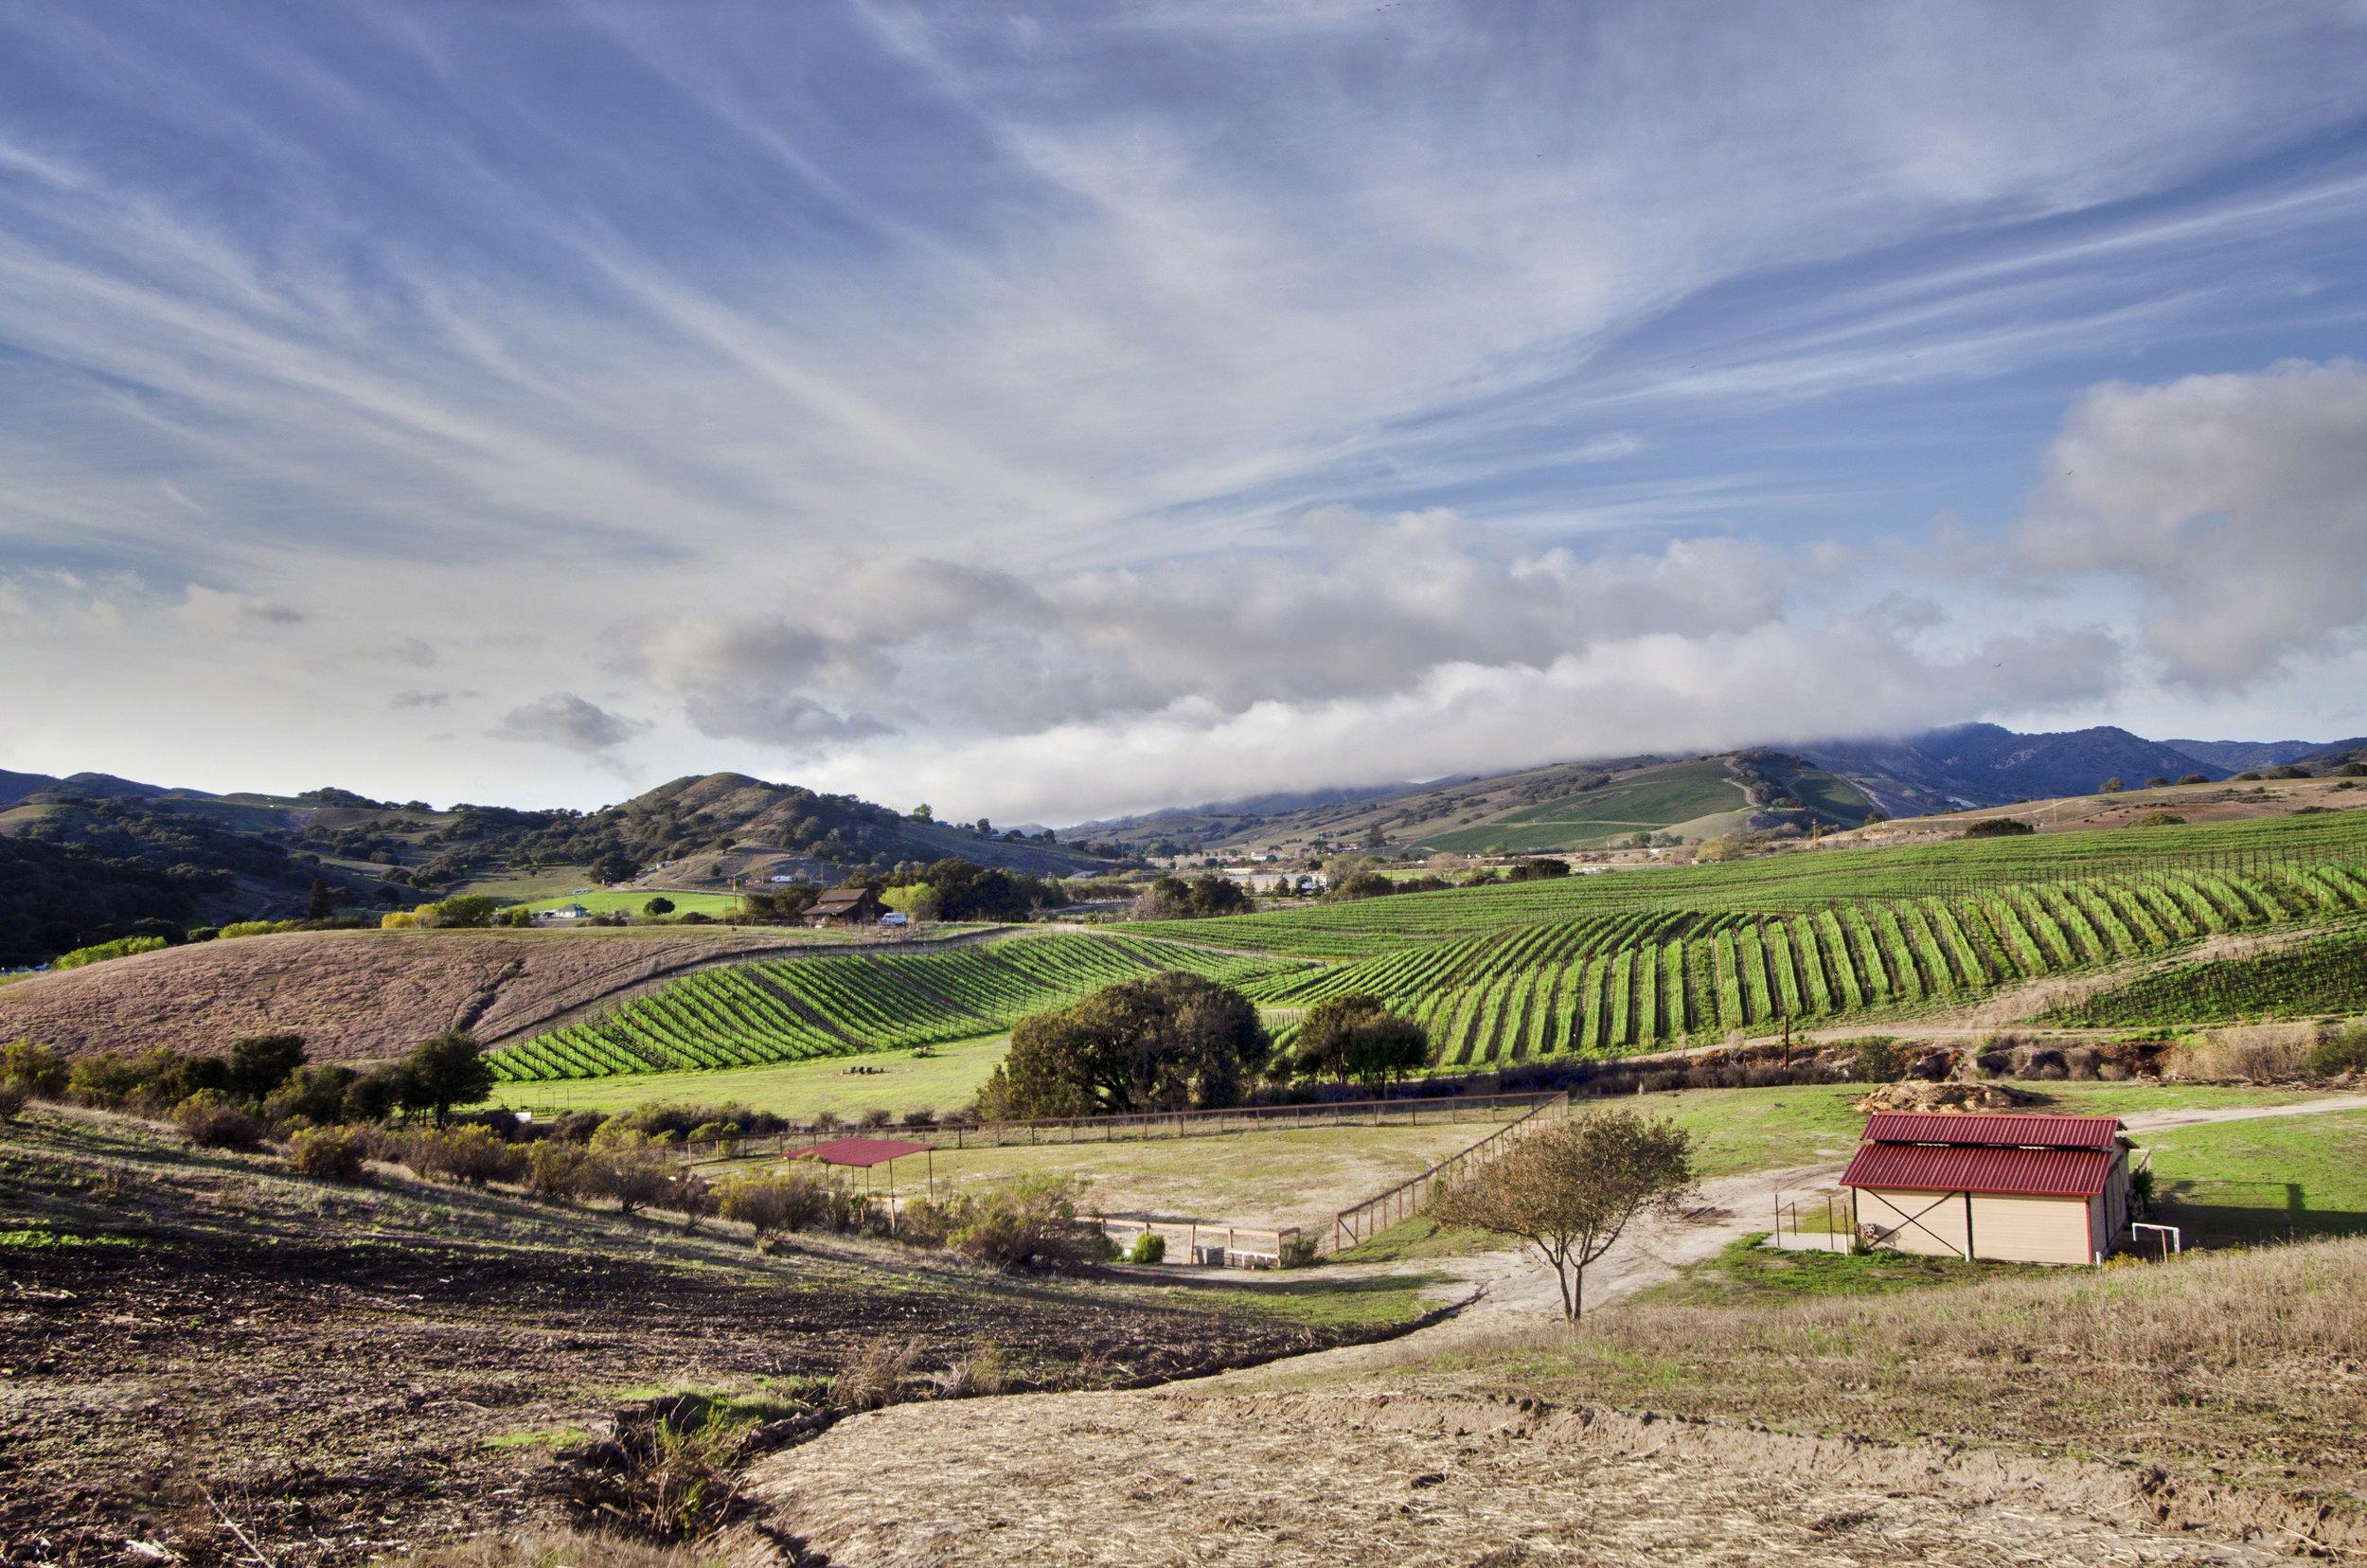 california-2014-01.jpg